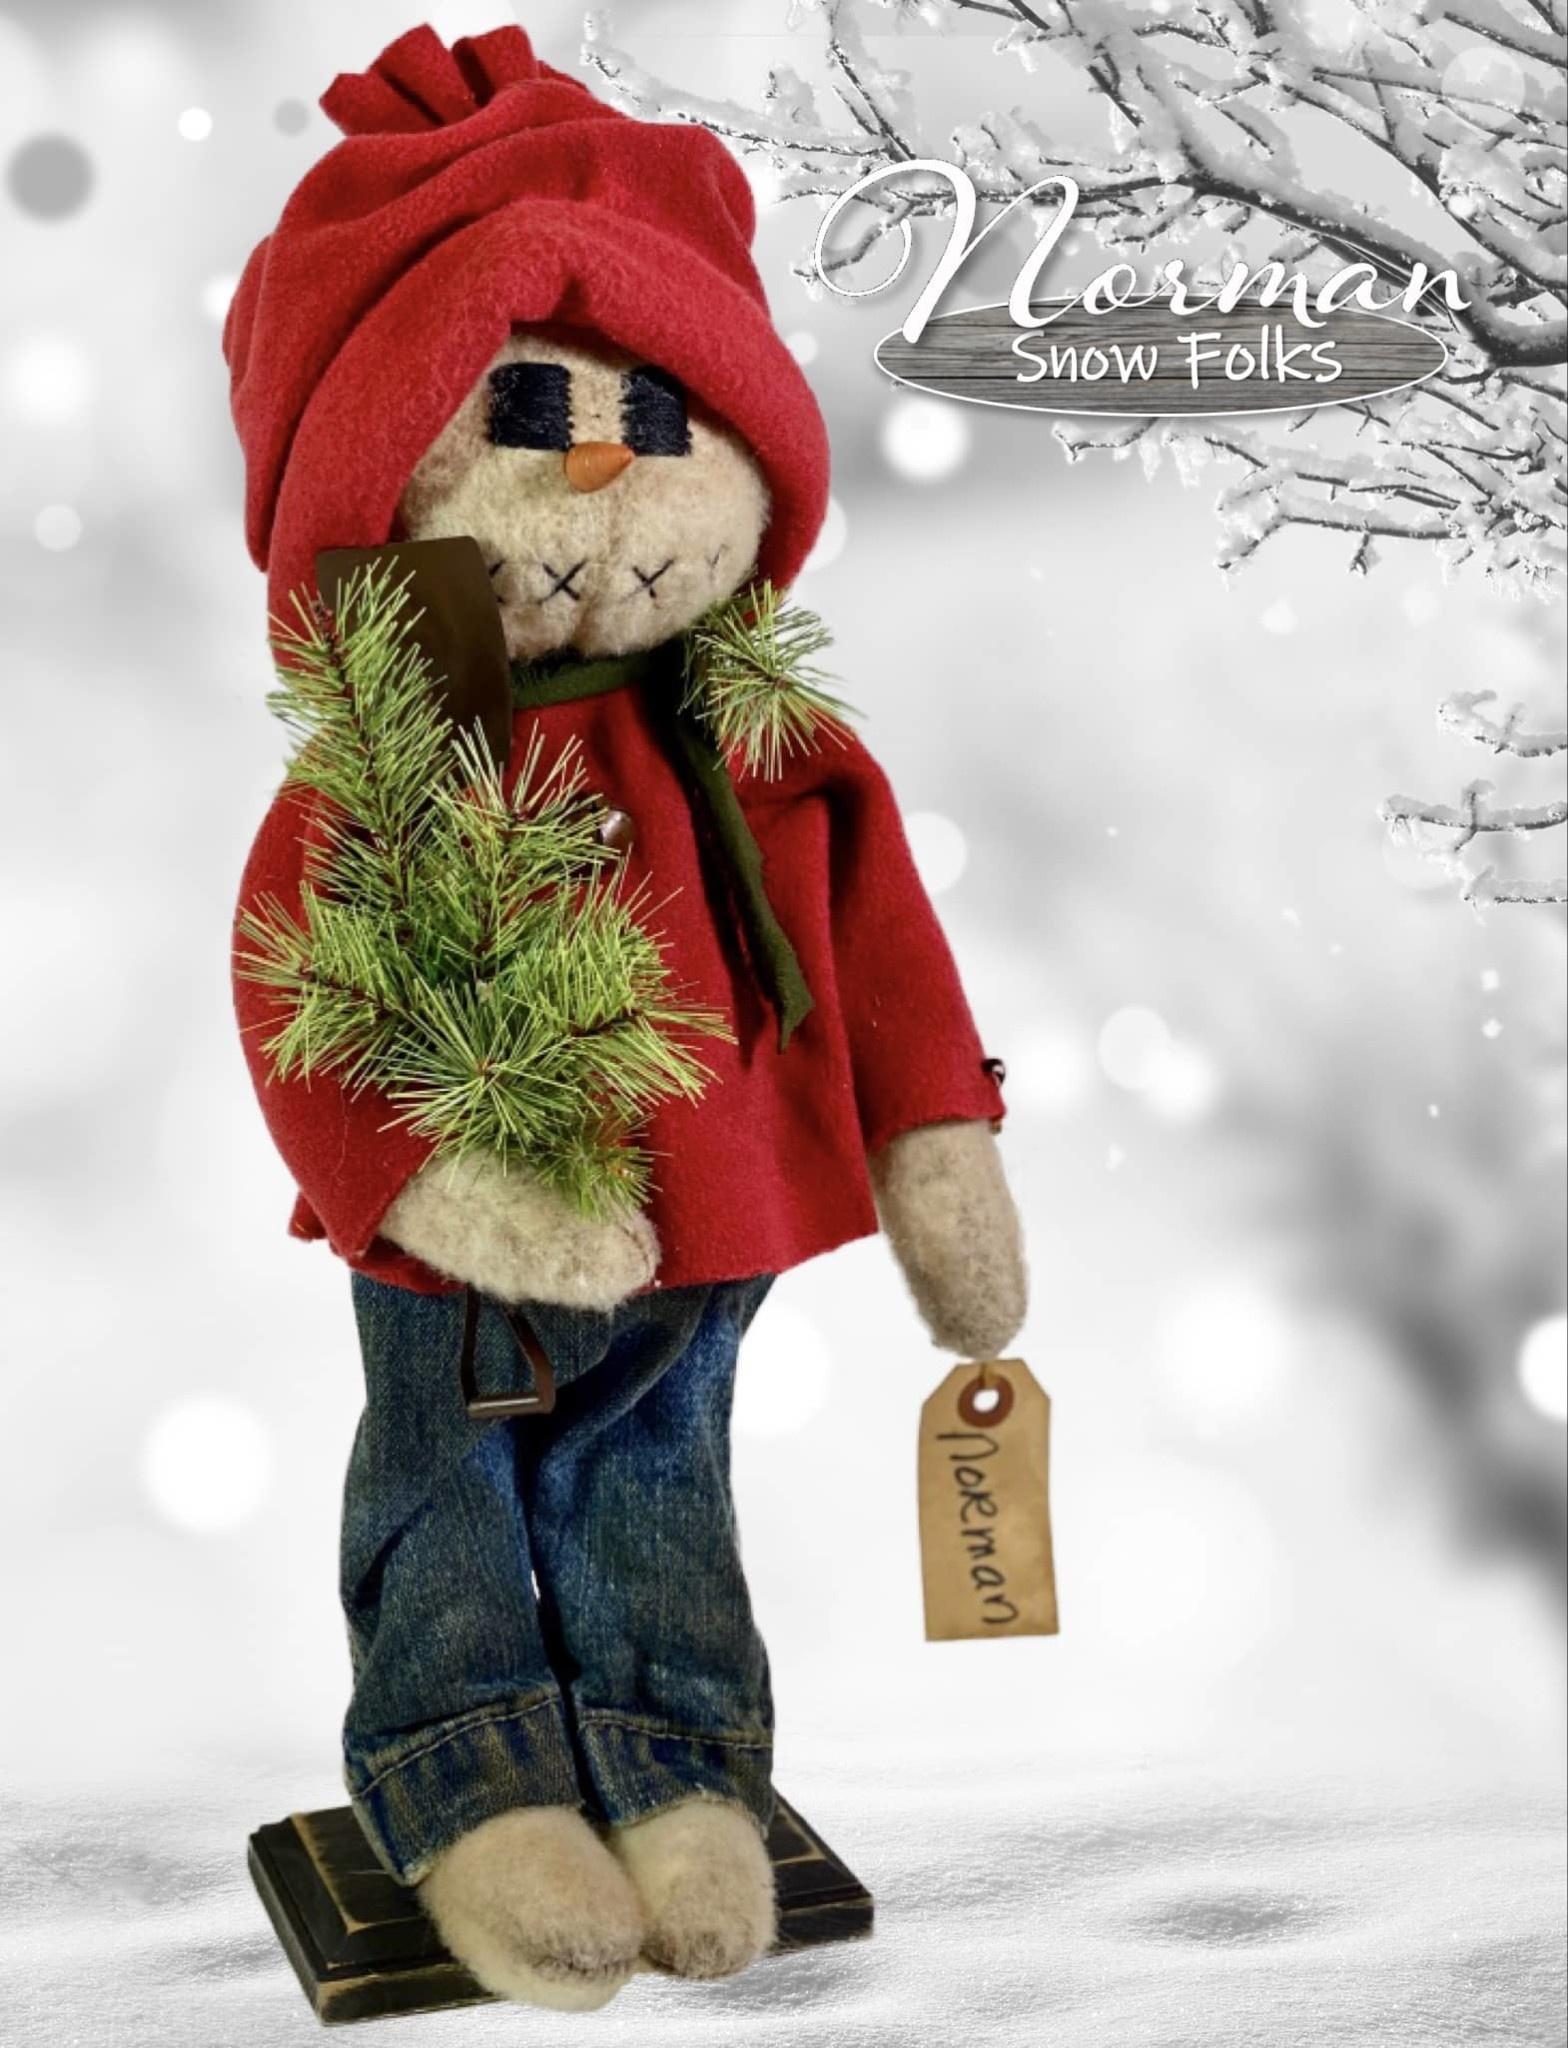 Nana's Farmhouse Norman Snow Boy w/Shovel & Greens